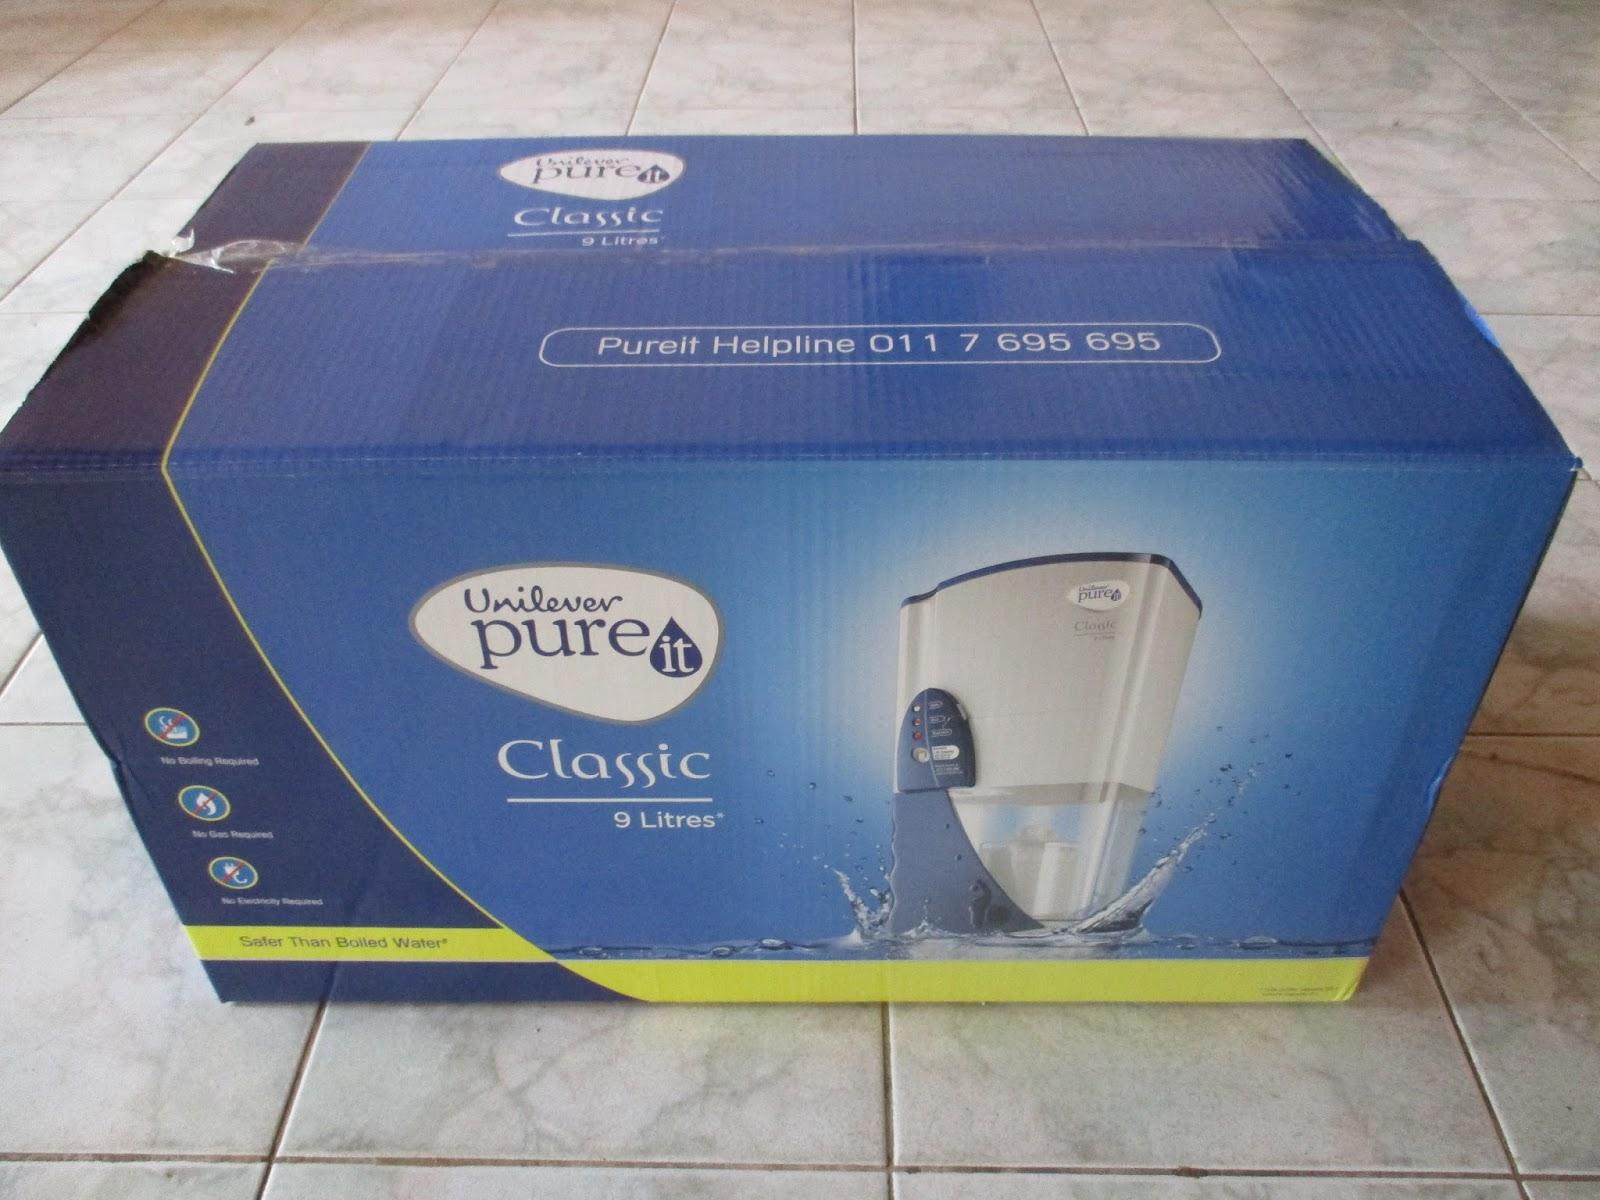 Ai Unilever Pureit Water Filter Price In Sri Lanka Purifier Classic 9l Rs 950000 Model And Auto Fill 1190000